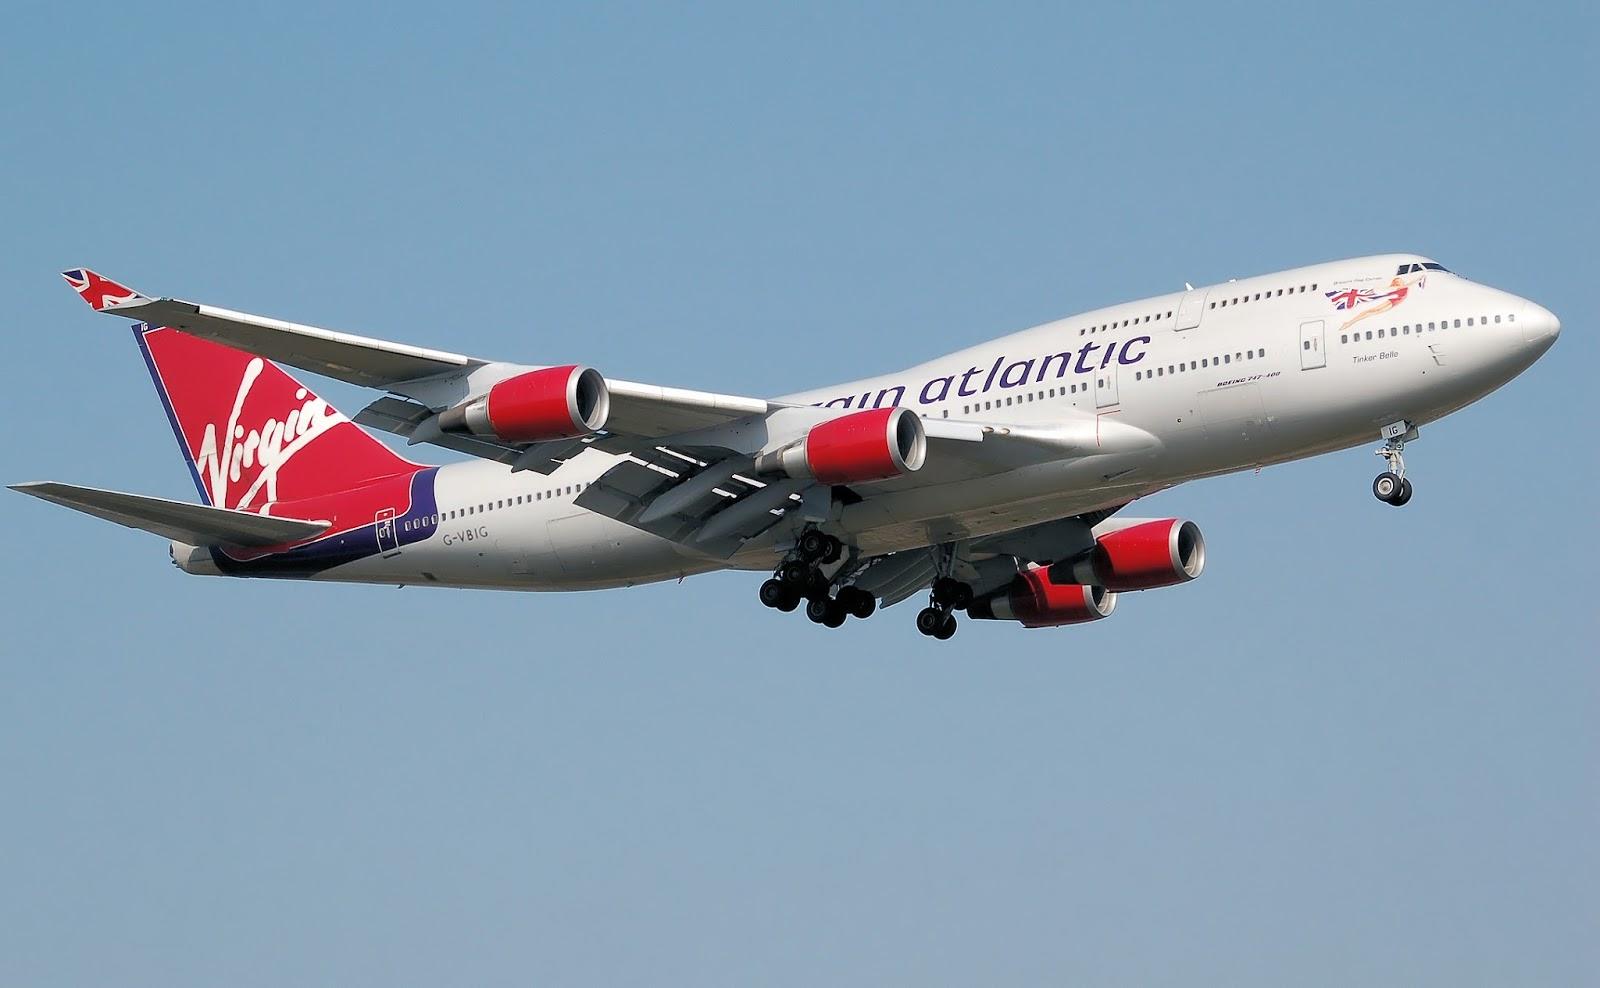 Virgin Atlantic Long Haul Flight - Manchester to Orlando